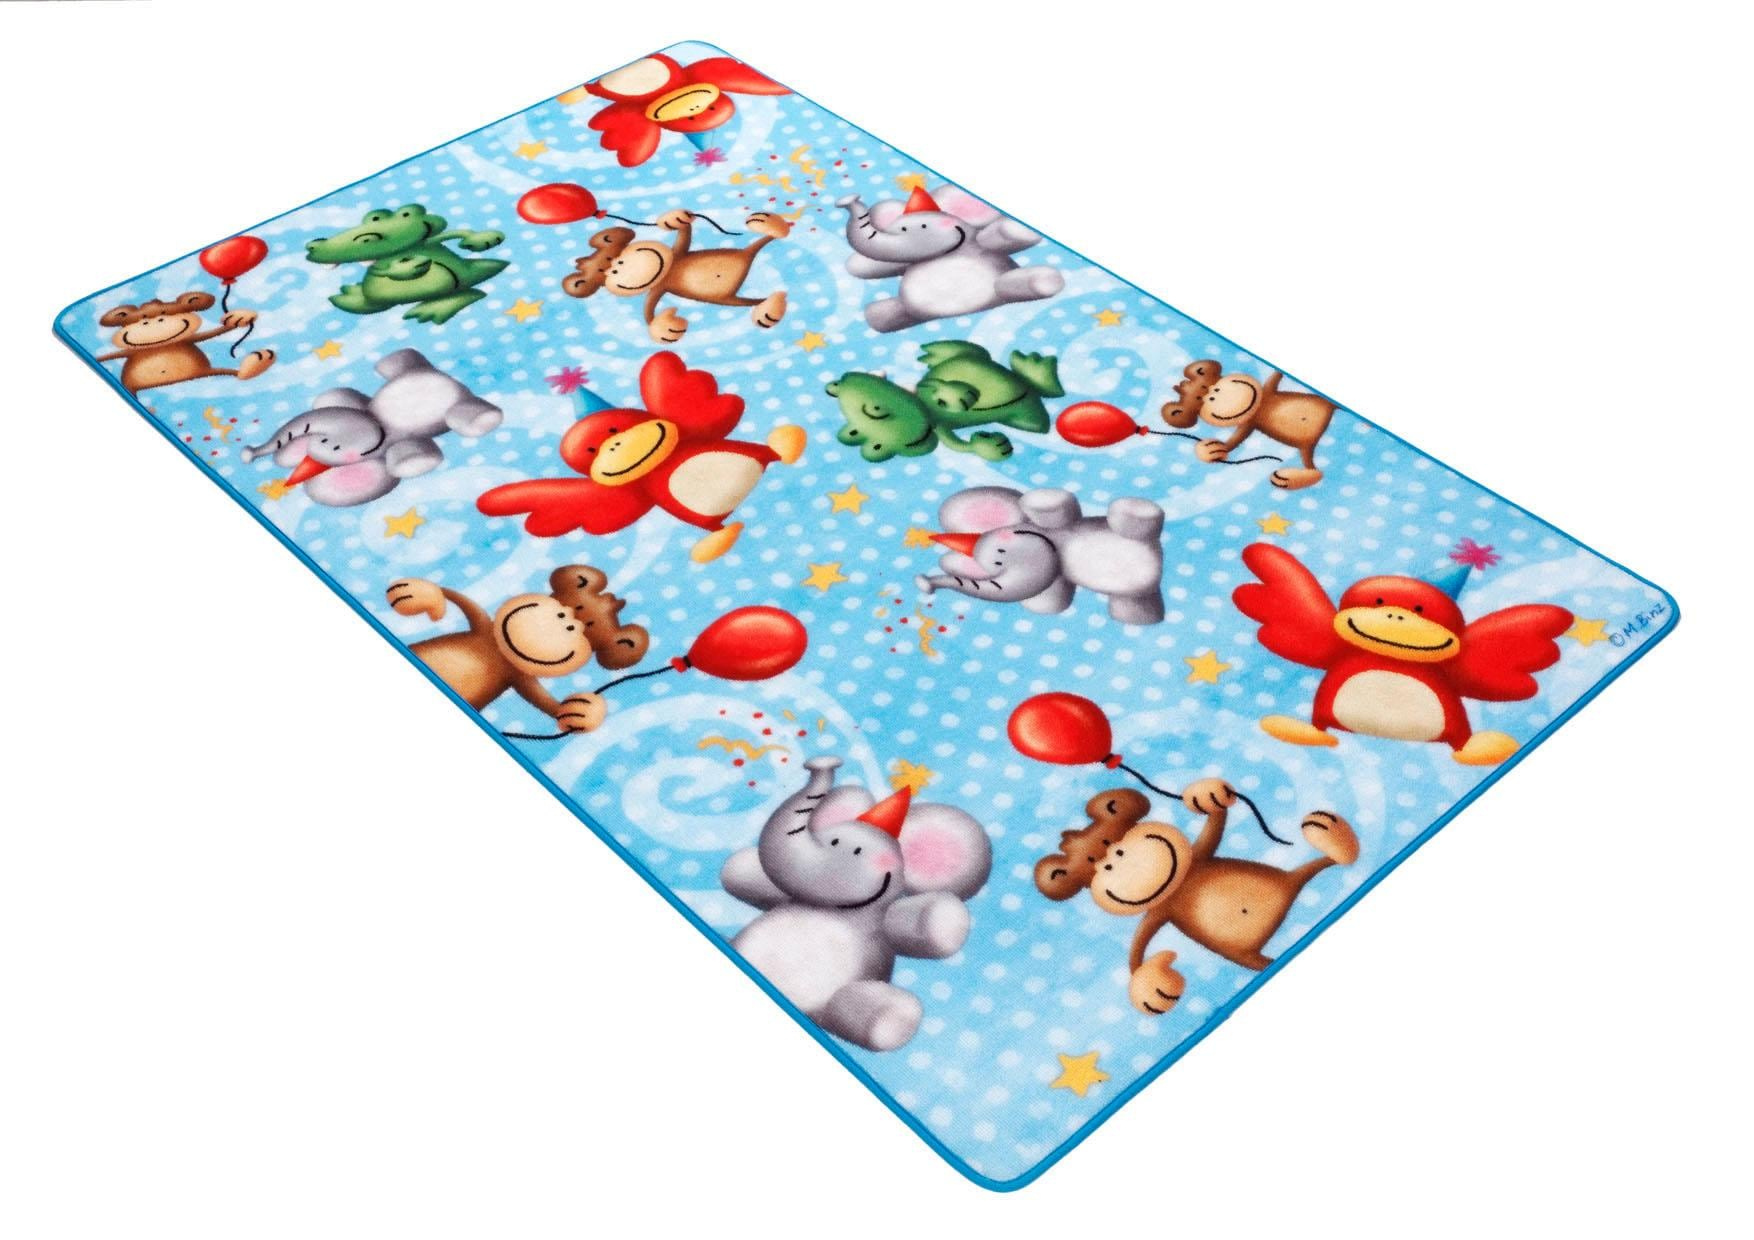 Kinderteppich Lovely Kids LK-4 Böing Carpet rechteckig Höhe 2 mm